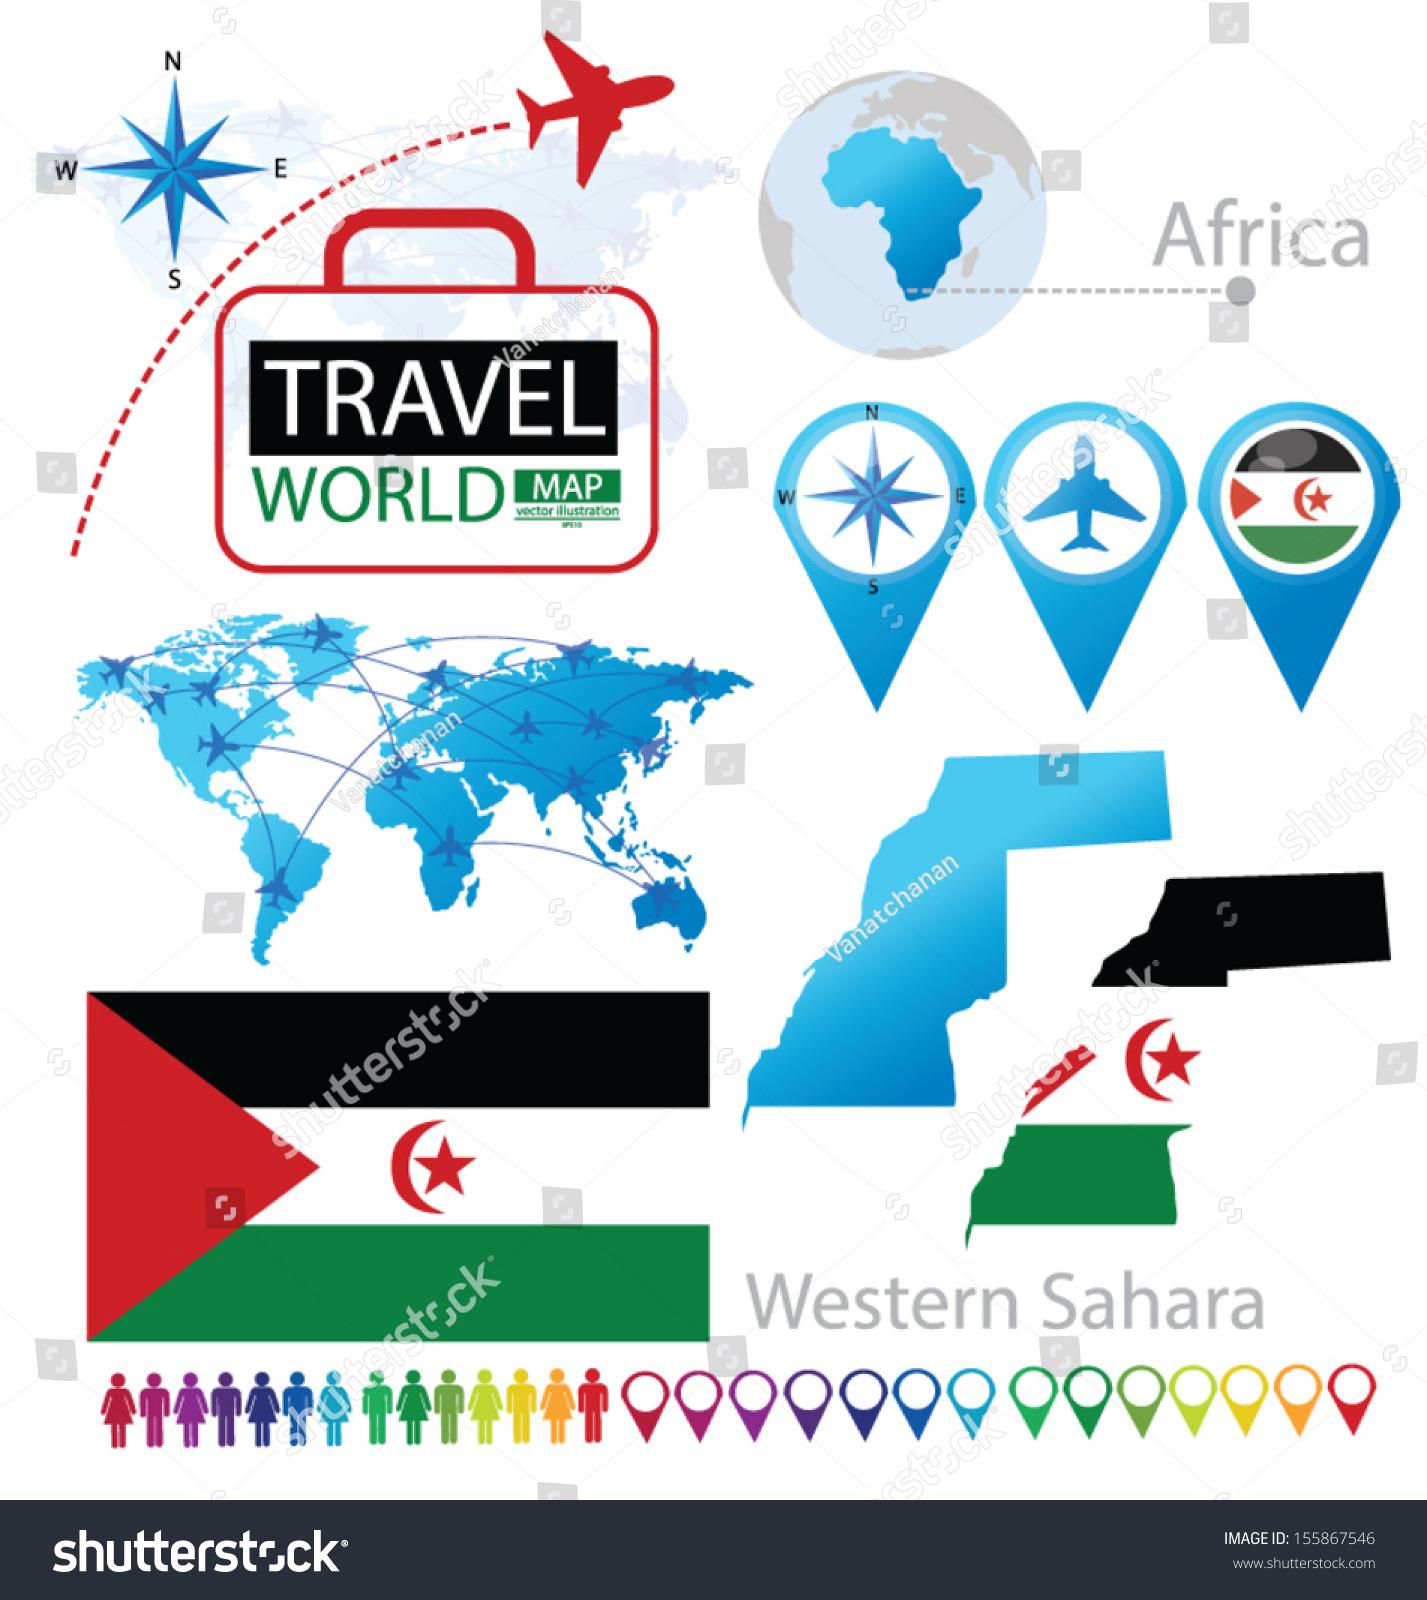 Image of: Western Sahara Flag World Map Travel Stock Vector Royalty Free 155867546